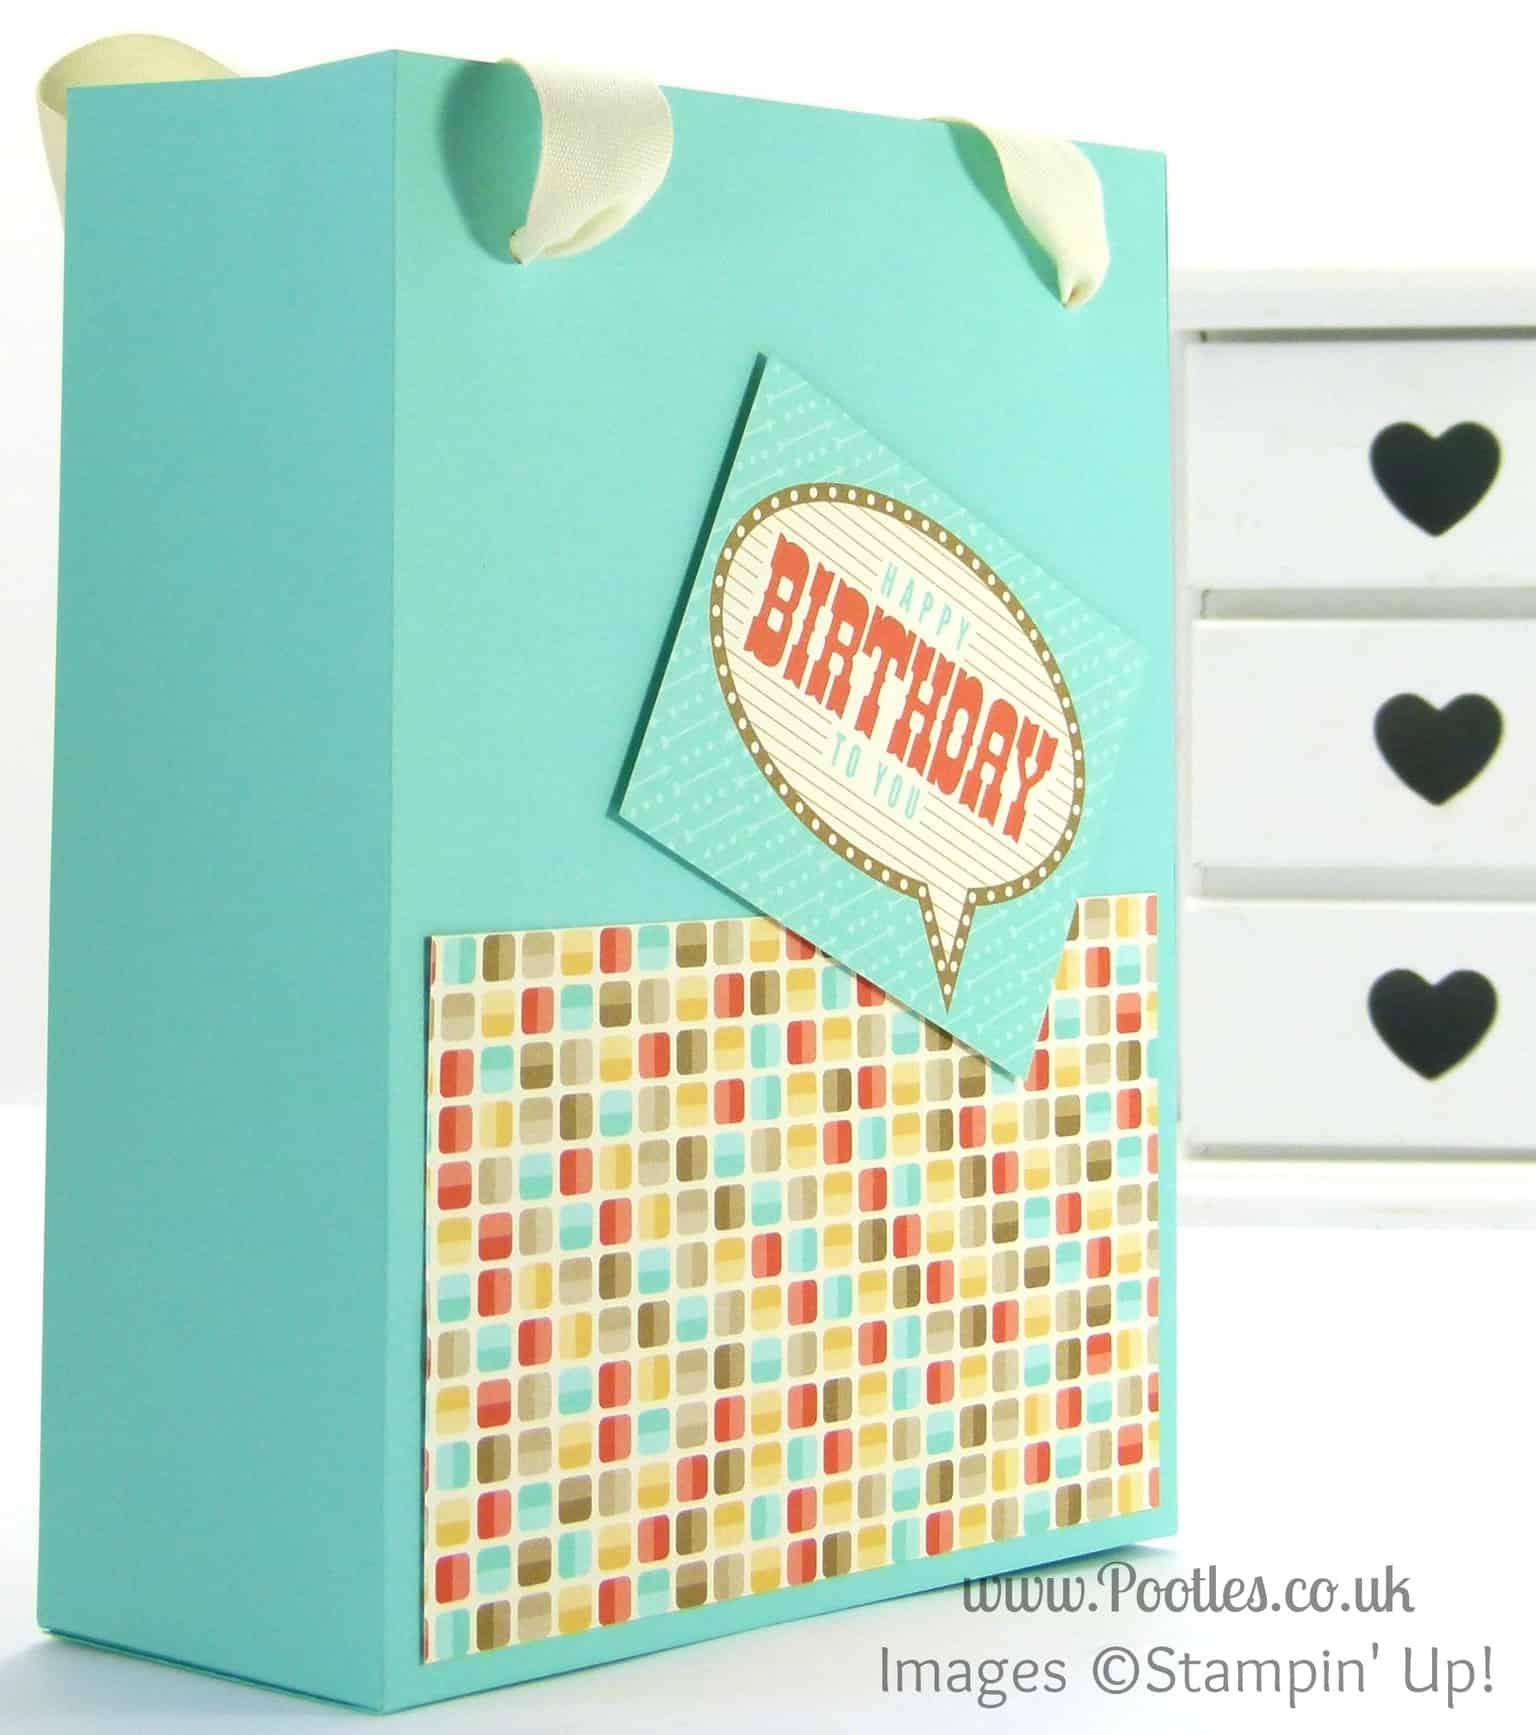 Stampin' Up! UK Demonstrator Pootles - Extra Massive Bag Box Tutorial Retro Fresh